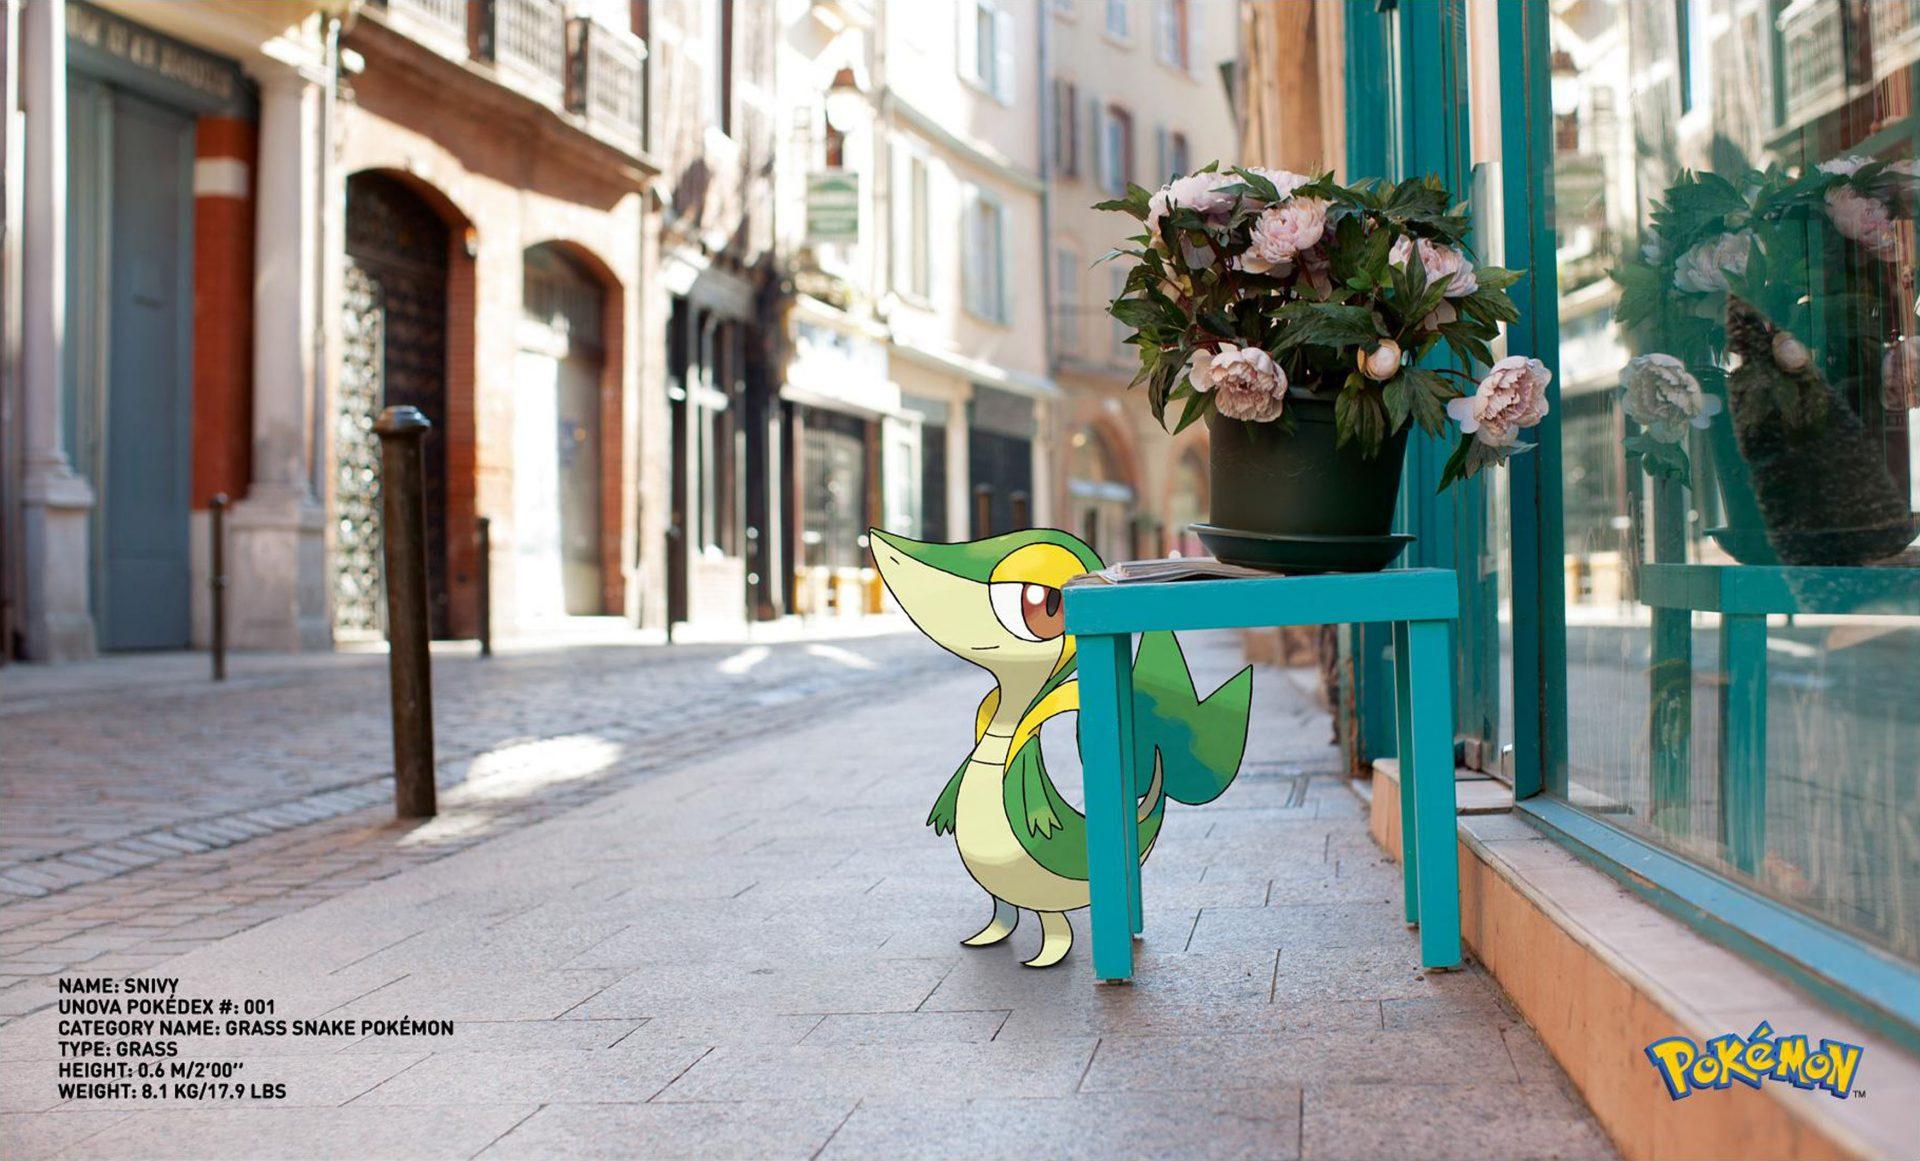 Pokemon Go Snivy Grass Faced Pokemon Dentsu London – Shaw and Shaw advertising photography photographer photographers